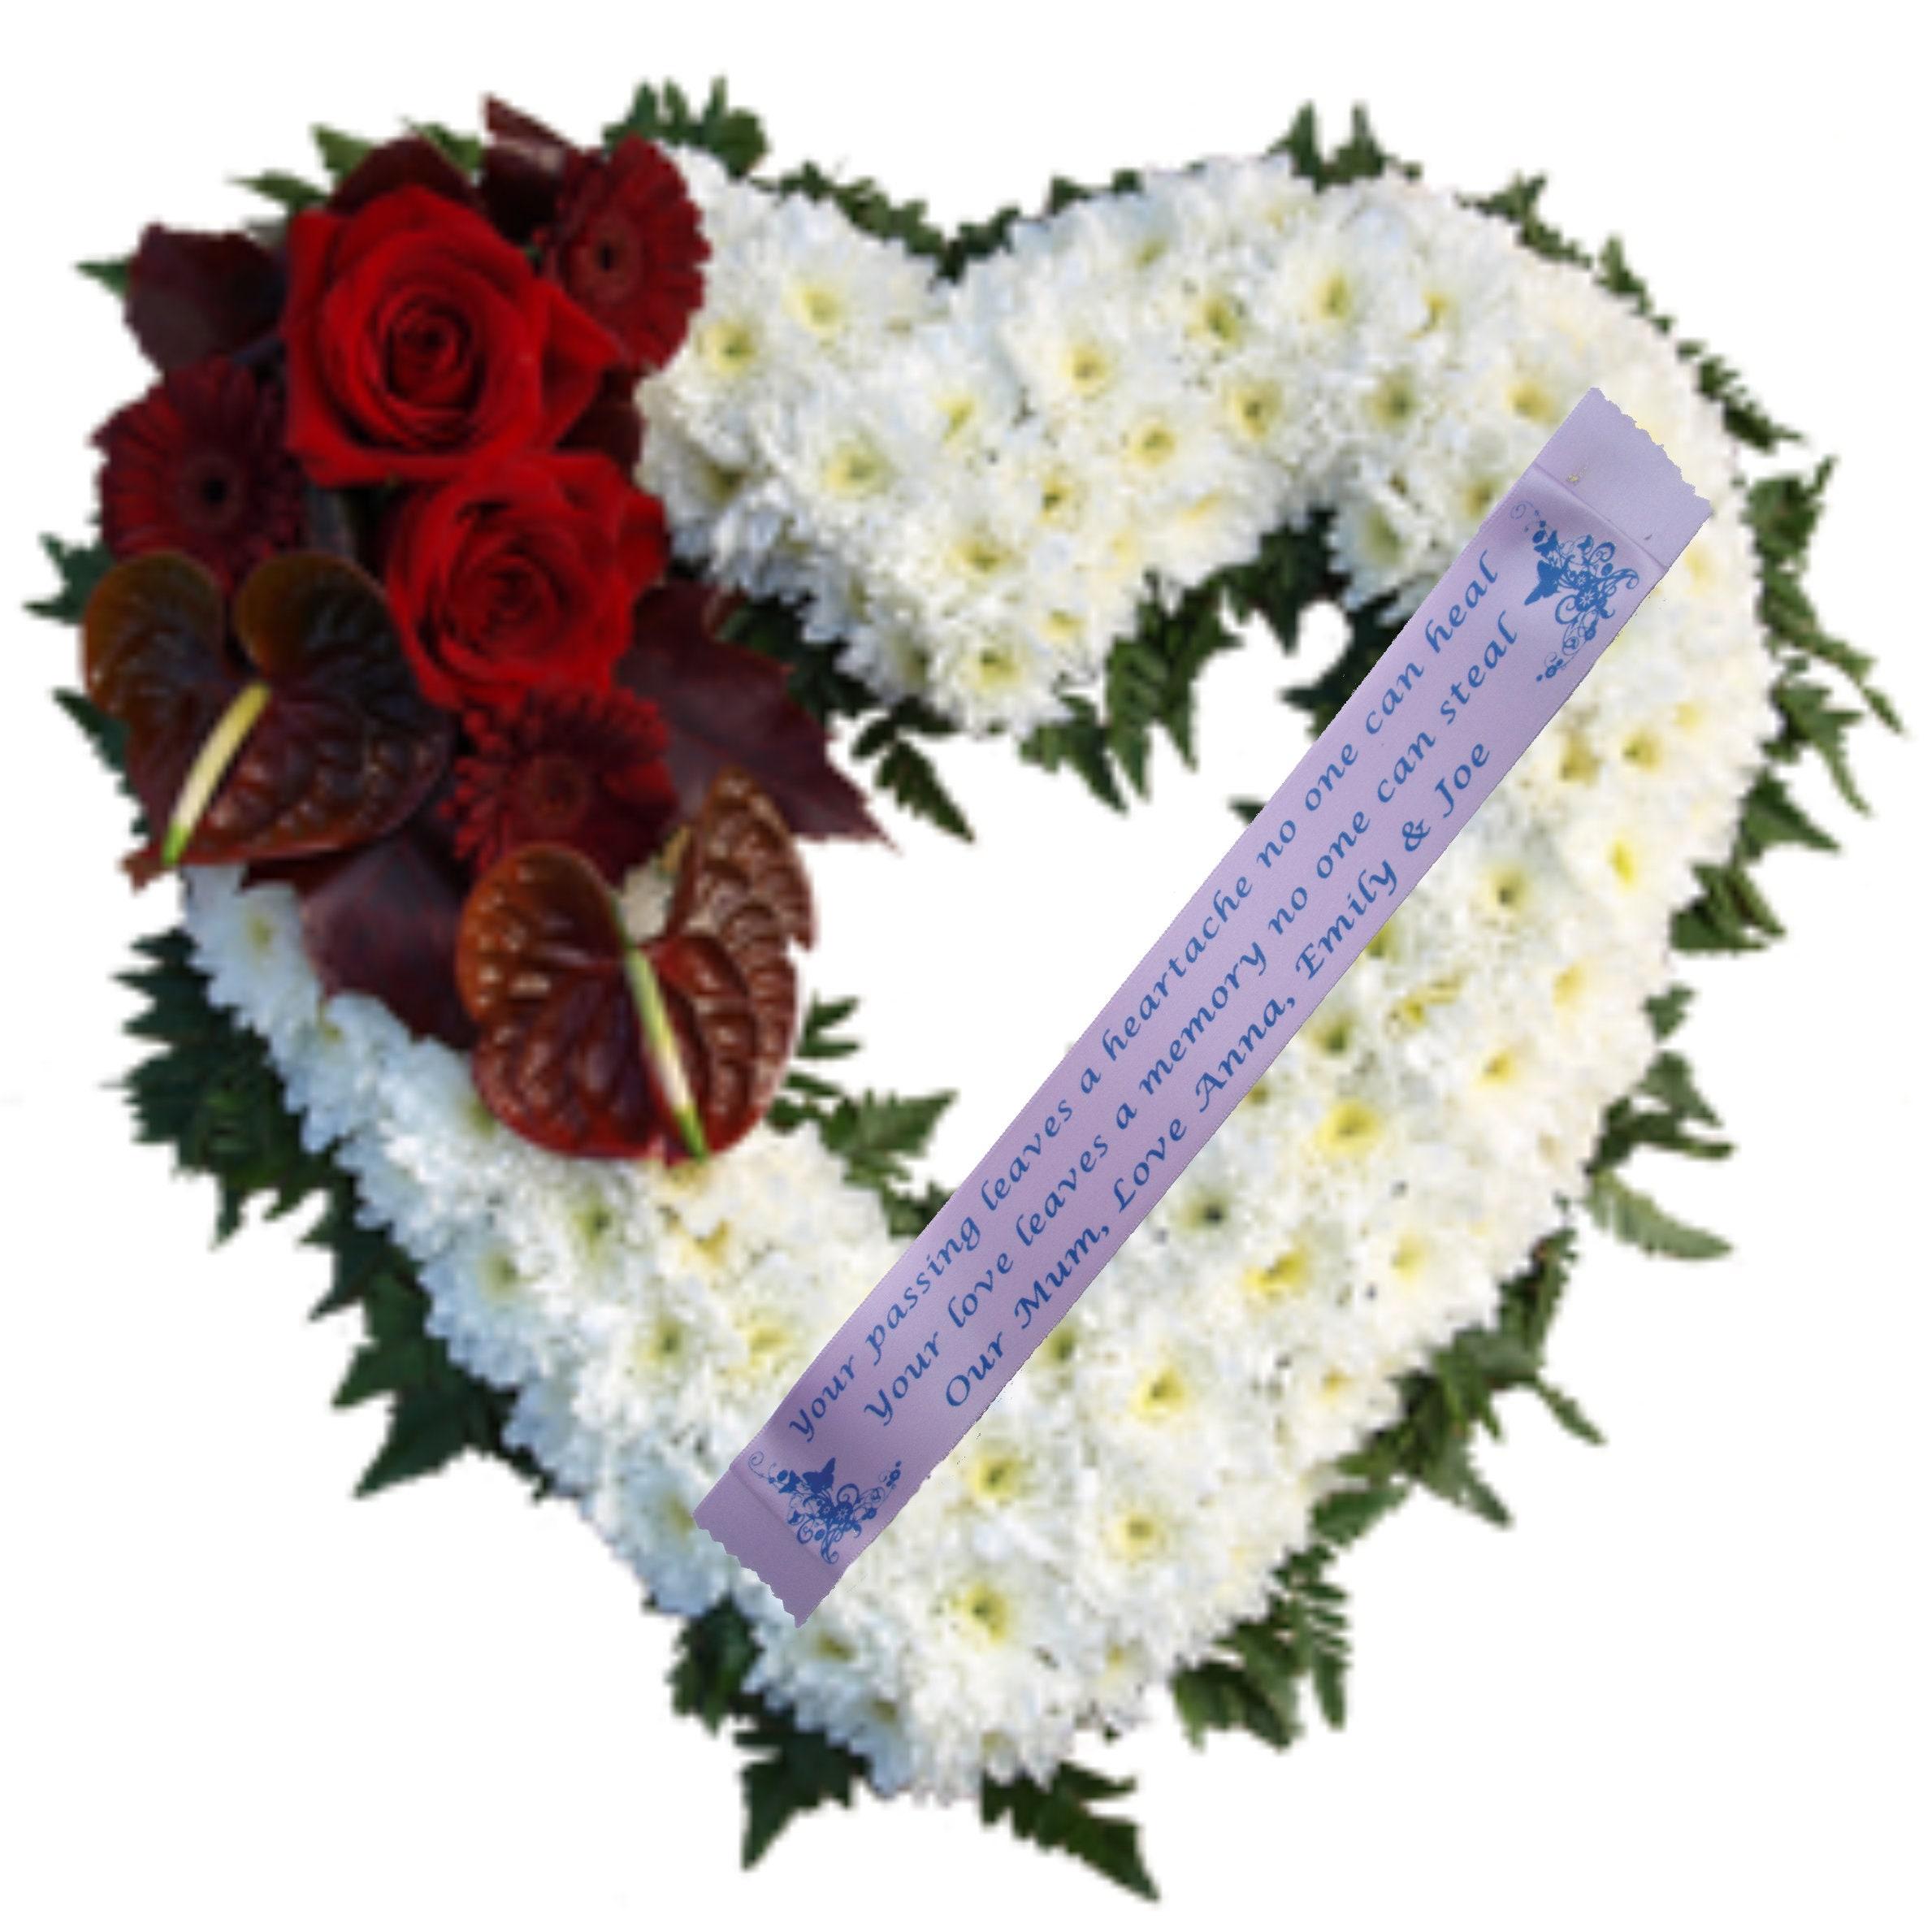 Personalised Funeral Ribbon 45mm Wreath Memorial Tribute Etsy